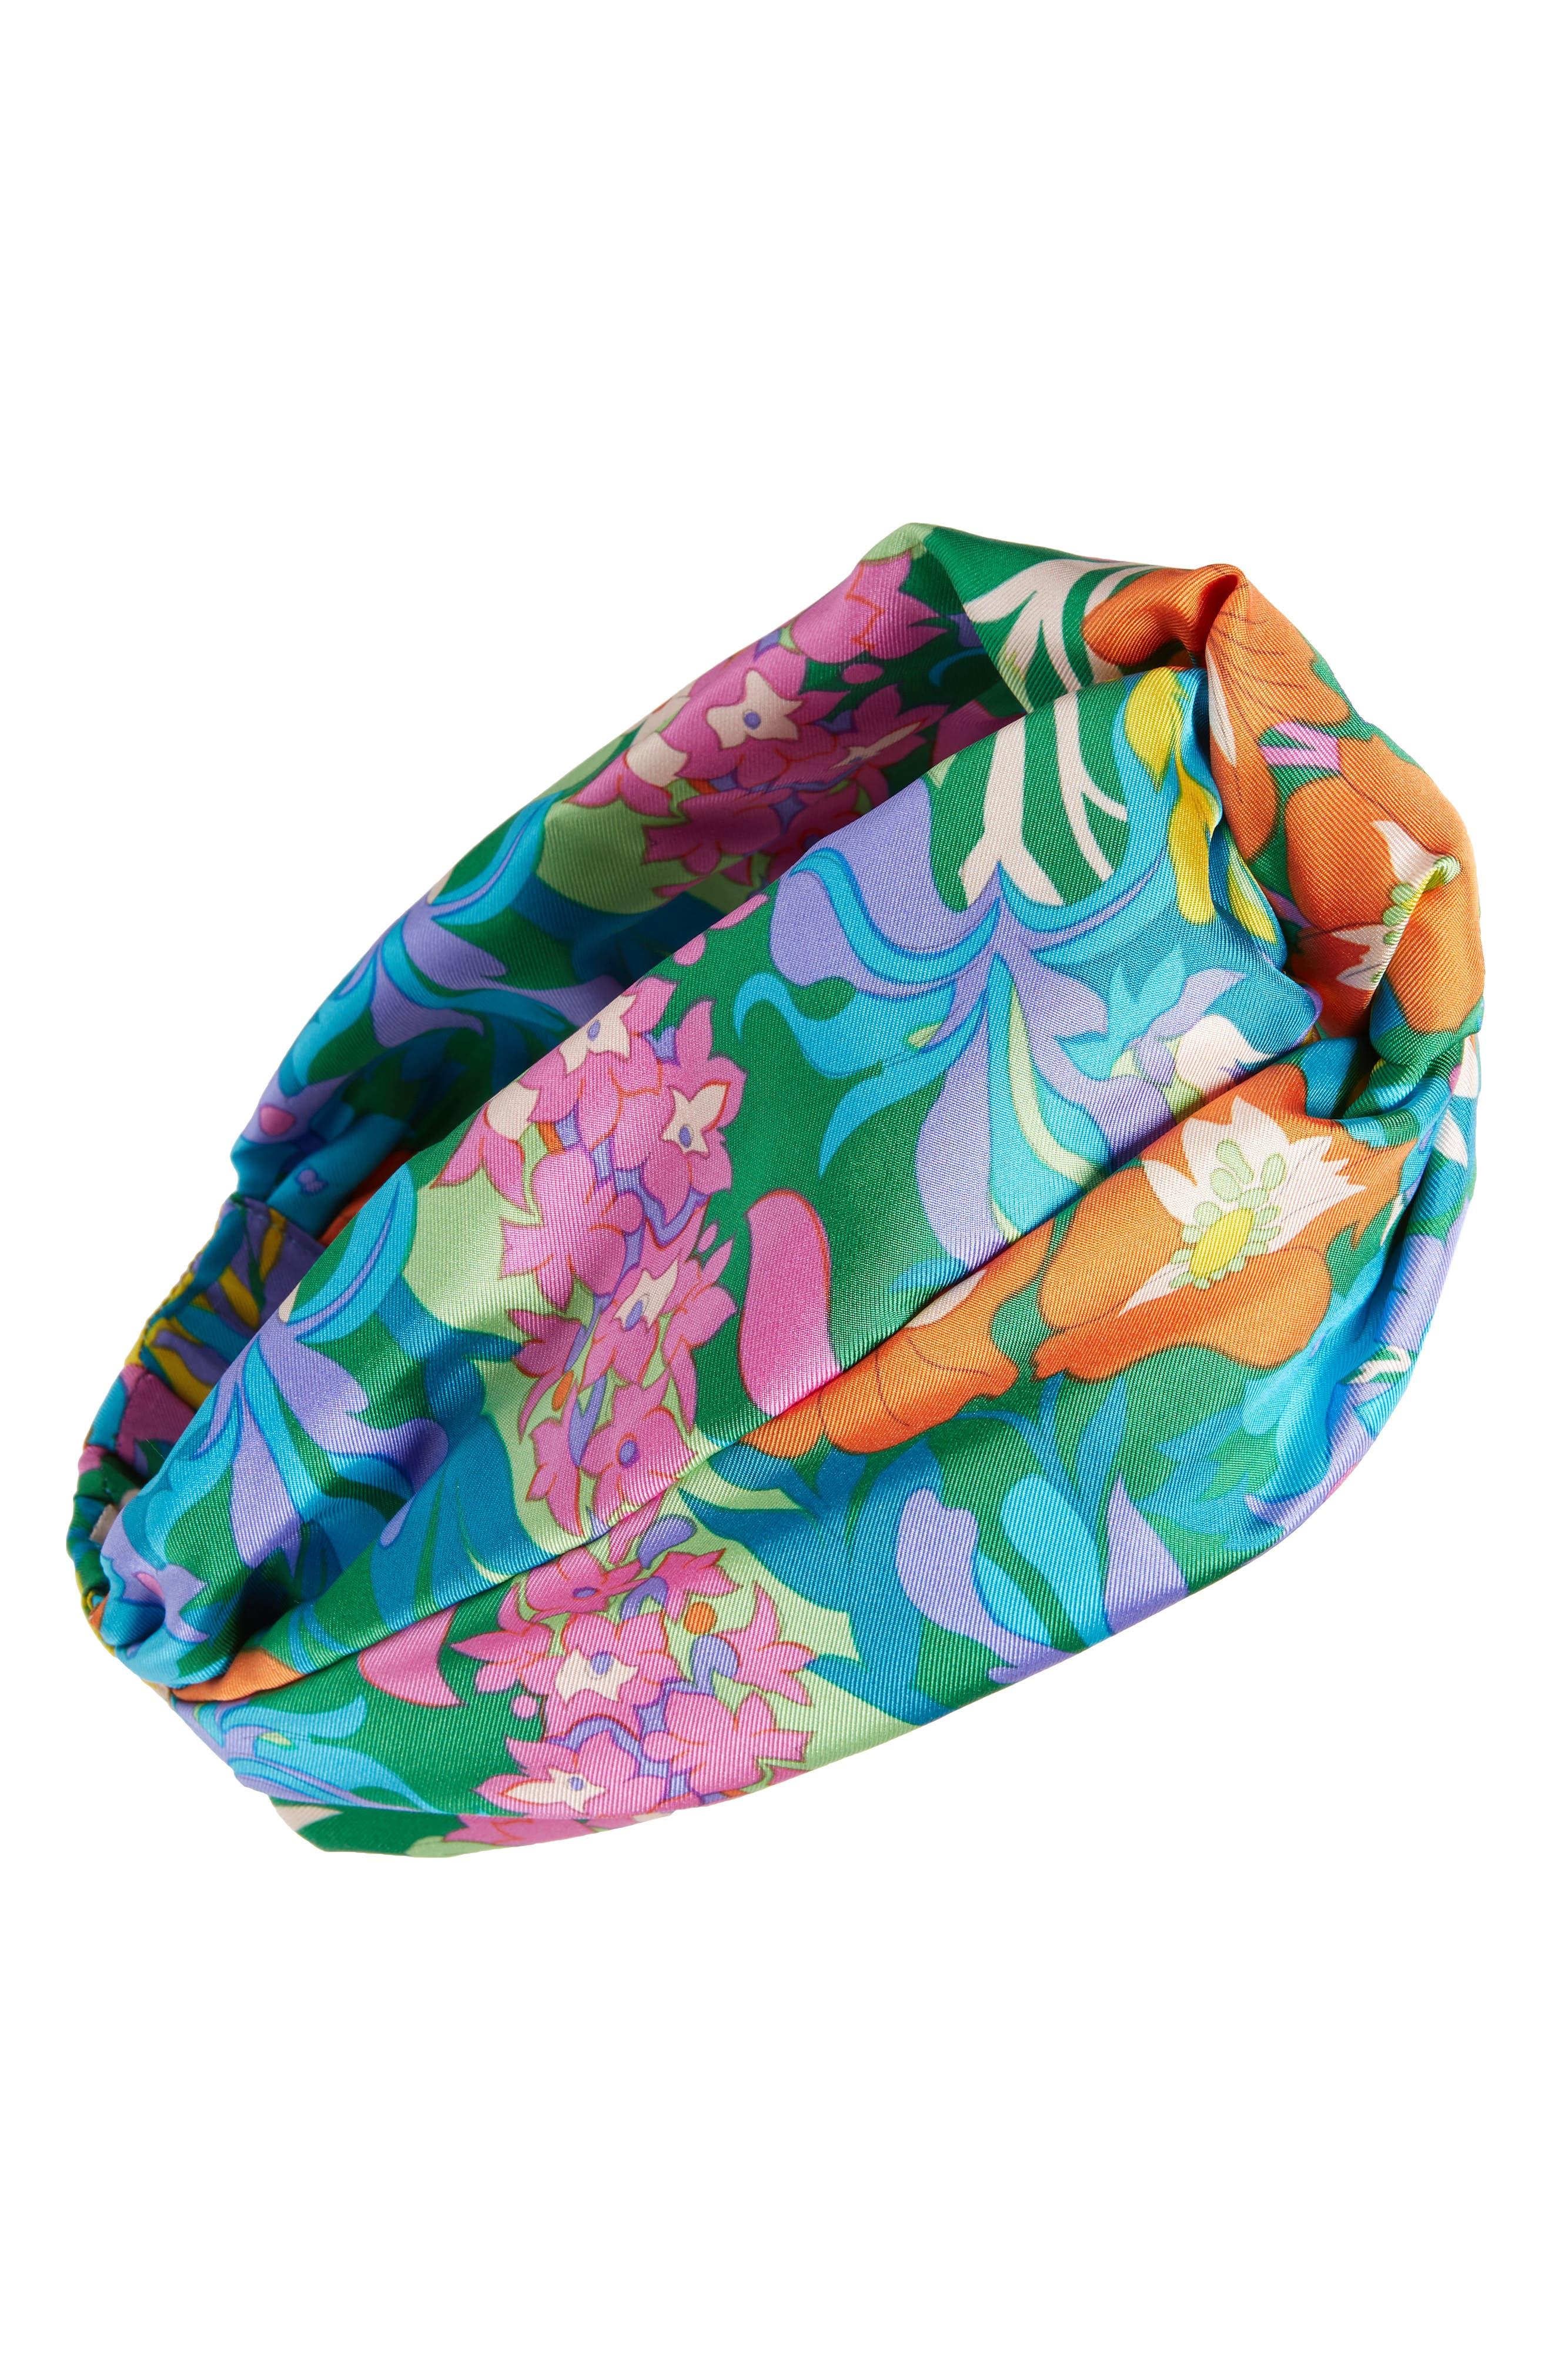 MANTERO, Twiggy Print Silk Head Wrap, Main thumbnail 1, color, 440